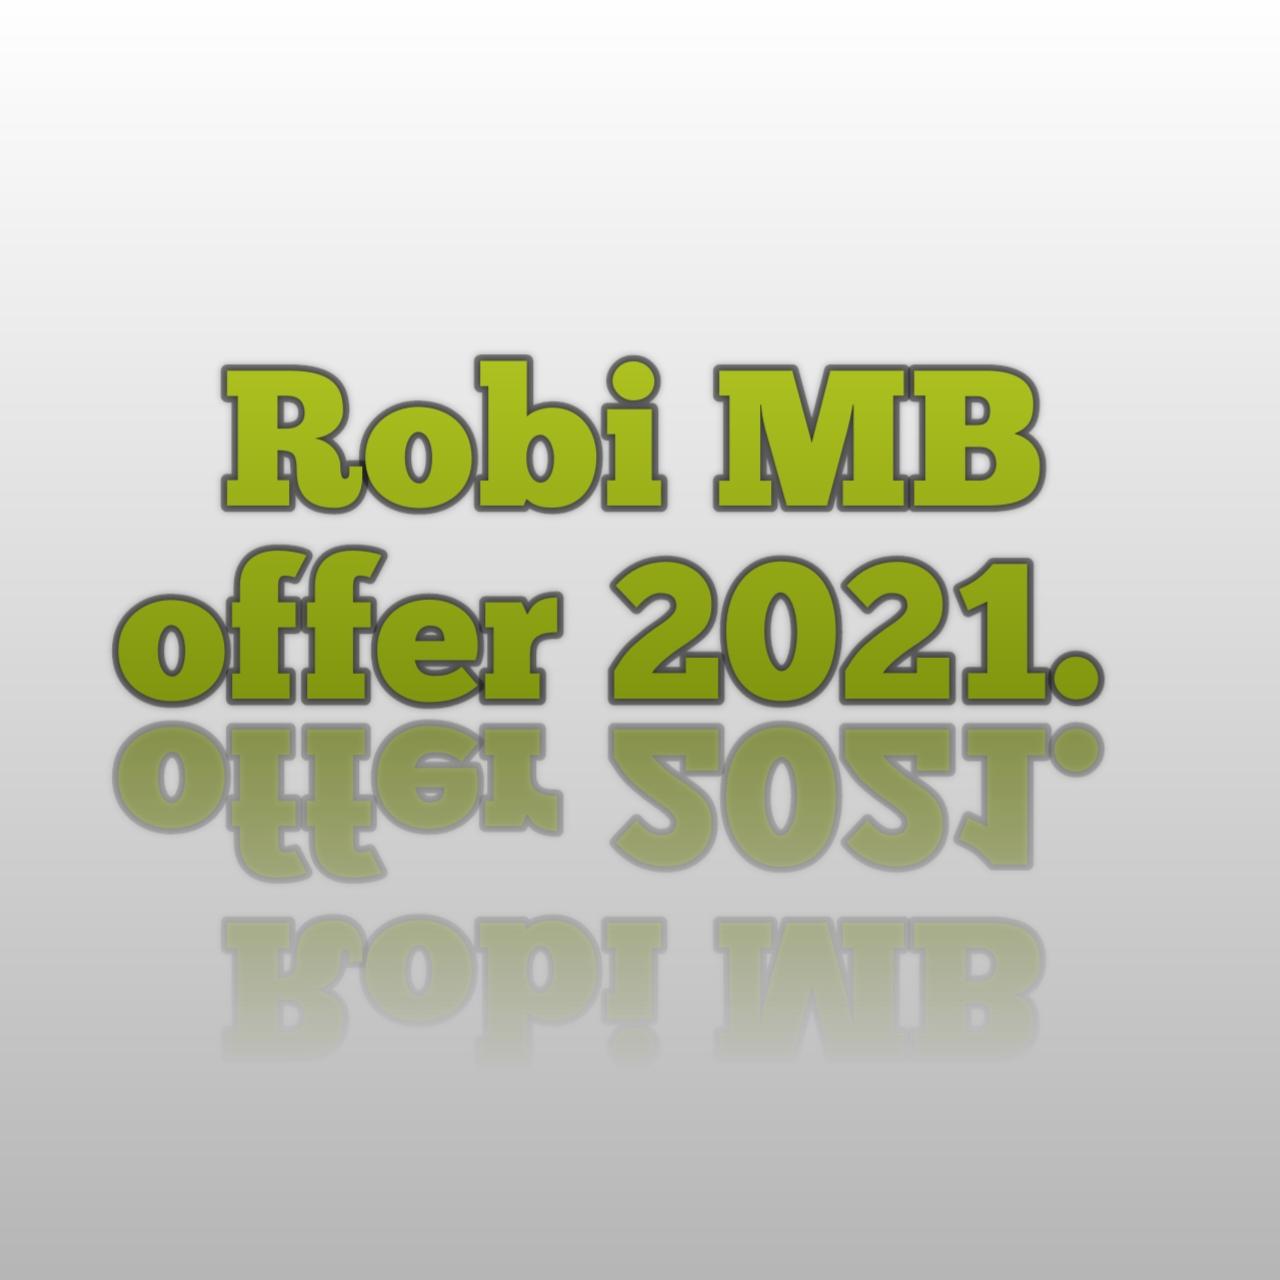 my robi, robi customer care number, robi Eid offer, robi Eid special offer, Robi, Robi career, Robi balance check, Robi mobilerobi offer, robi MB offer, robi recharge, robi mb check, robi mb offer 2021, robi new offer, robi mb offer 2021, Robi internet offer 2021, robi offer, robi MB offer, robi MB offer 2020, robi MB offer 30 days, robi 9 Tk 1GB offer, robi 1GB offer, robi All package, robi internet offer 7 days, robi offer, রবি এমবি অফার 2021, রবি সিম অফার, রবি সিম, রবি সিমের নতুন অফার, রবি কাস্টমার কেয়ার নাম্বার, রবি এমবি চেক, রবি নাম্বার চেক, রবি নাম্বার দেখার কোড, রবি  বন্ধ সিম অফার, রবি এমবি দেখার কোড,